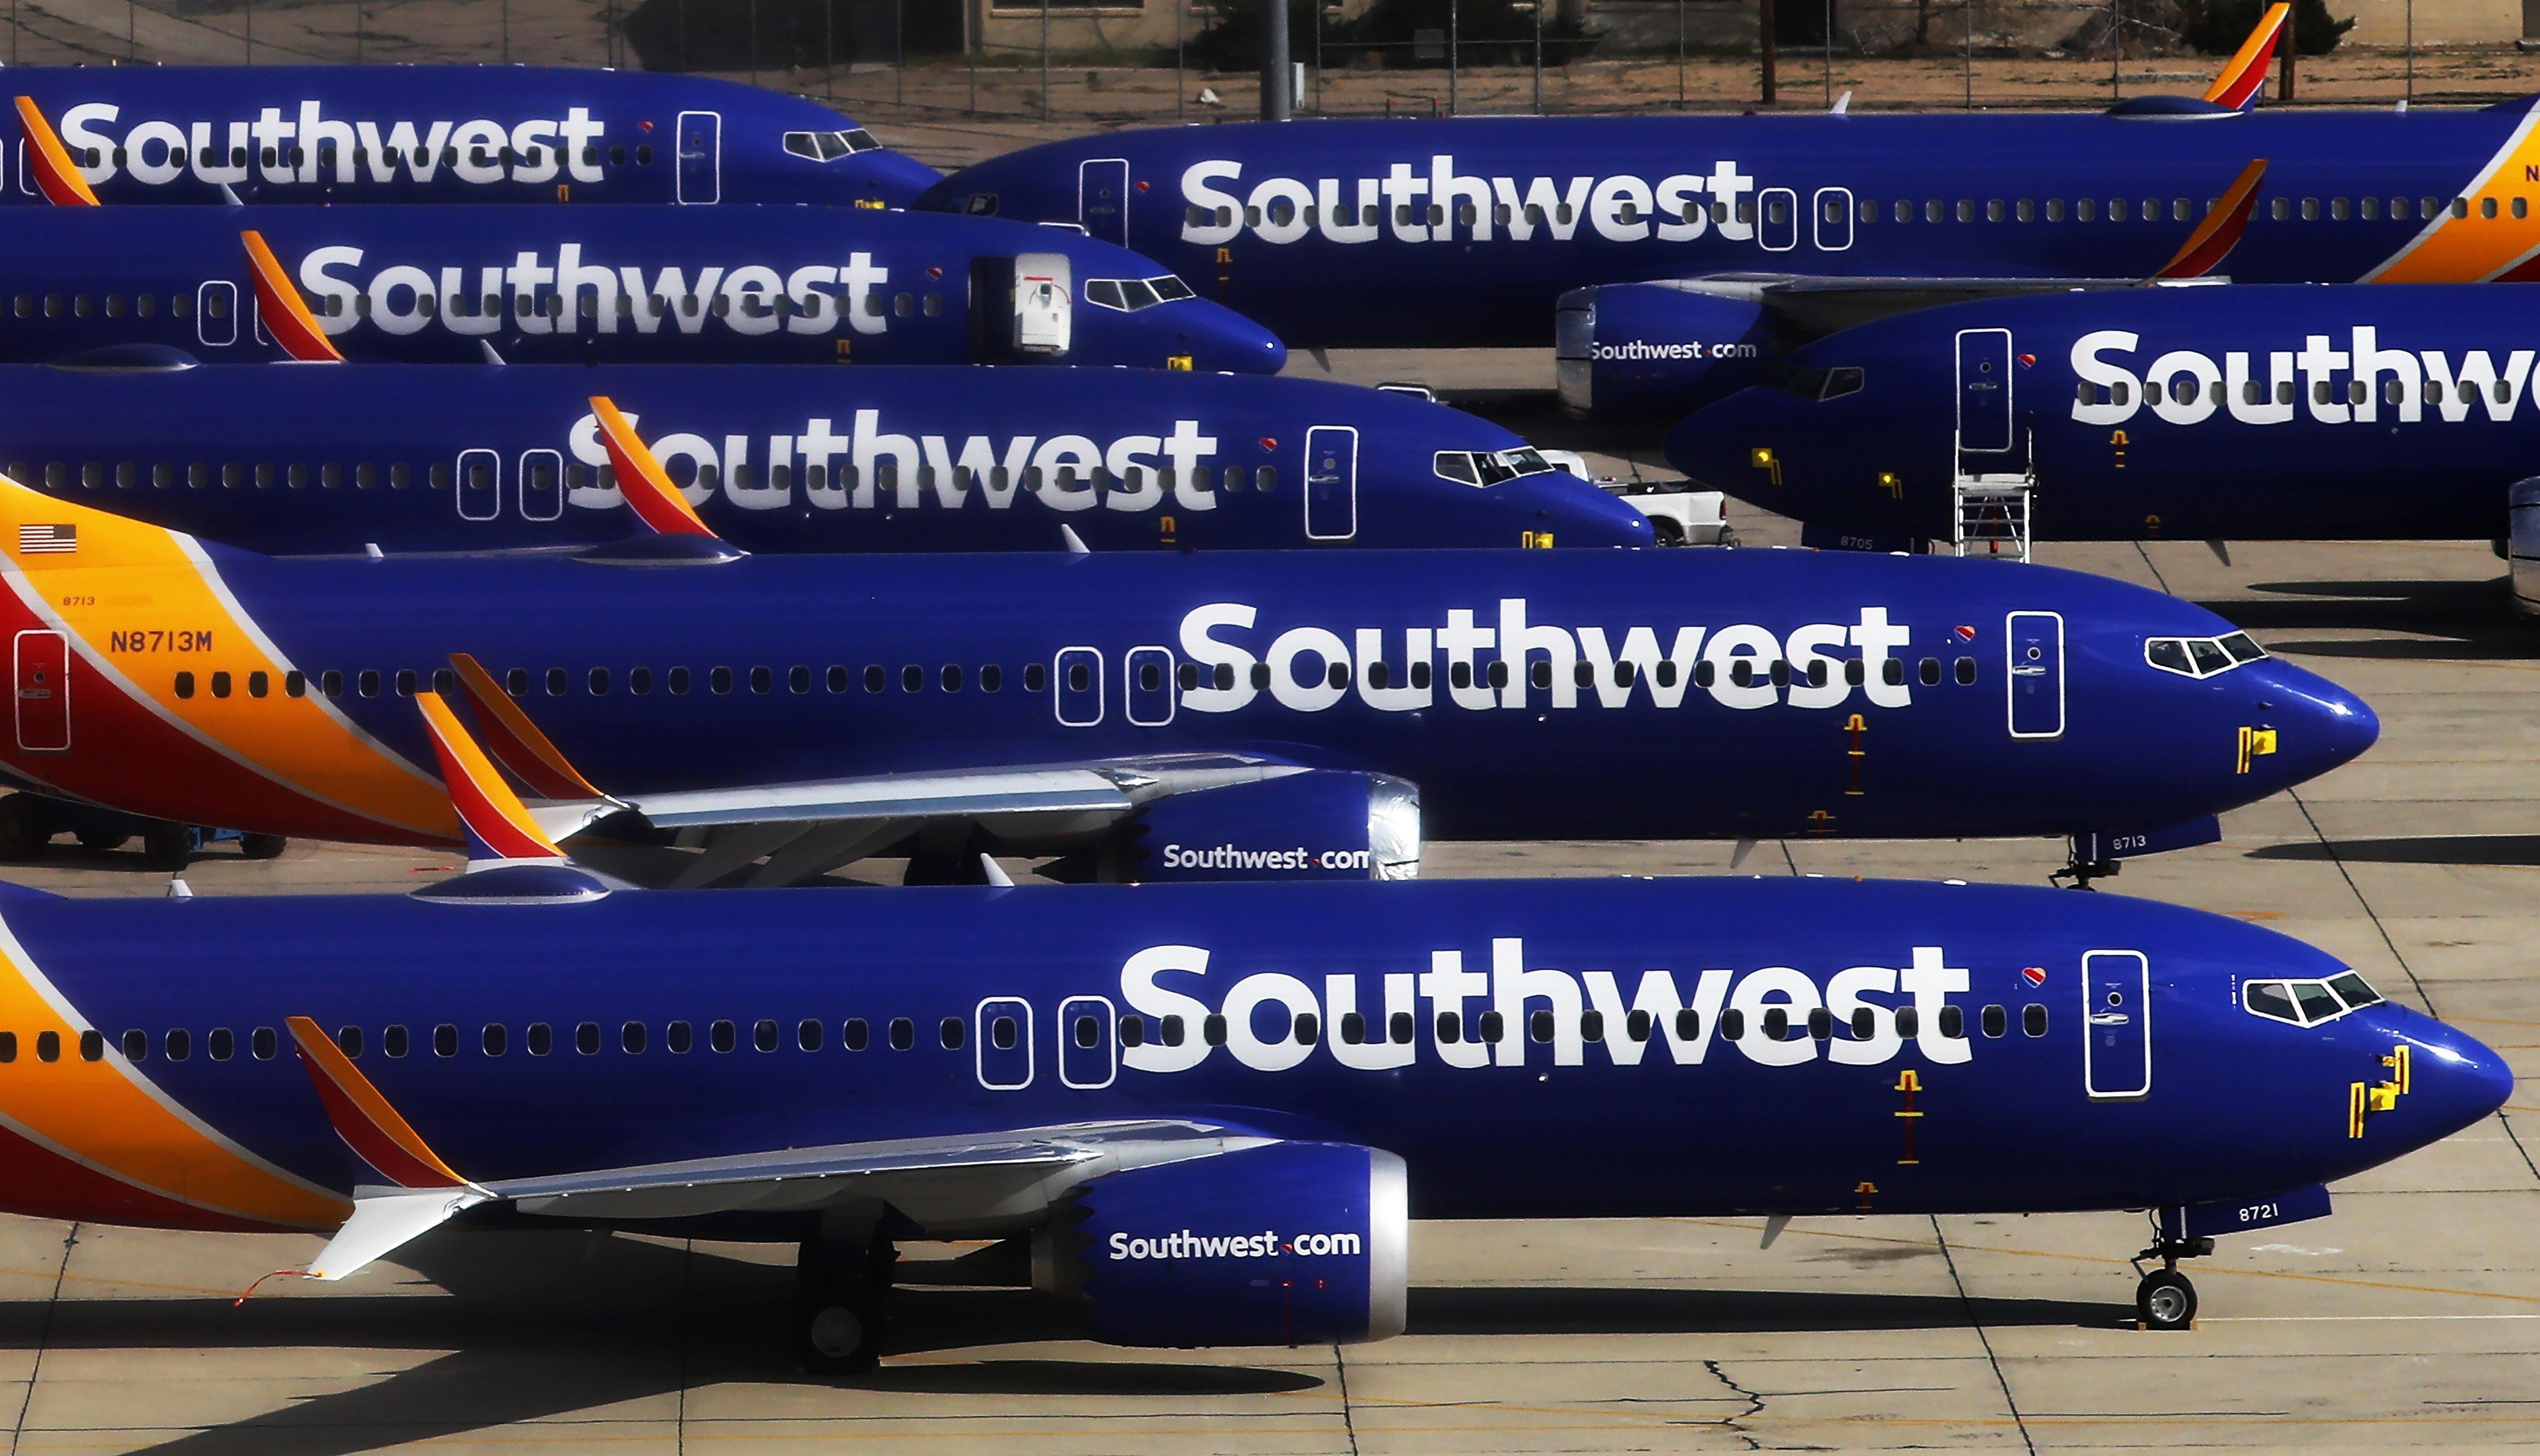 Southwest extends 737 Max flight cancellations through November 2